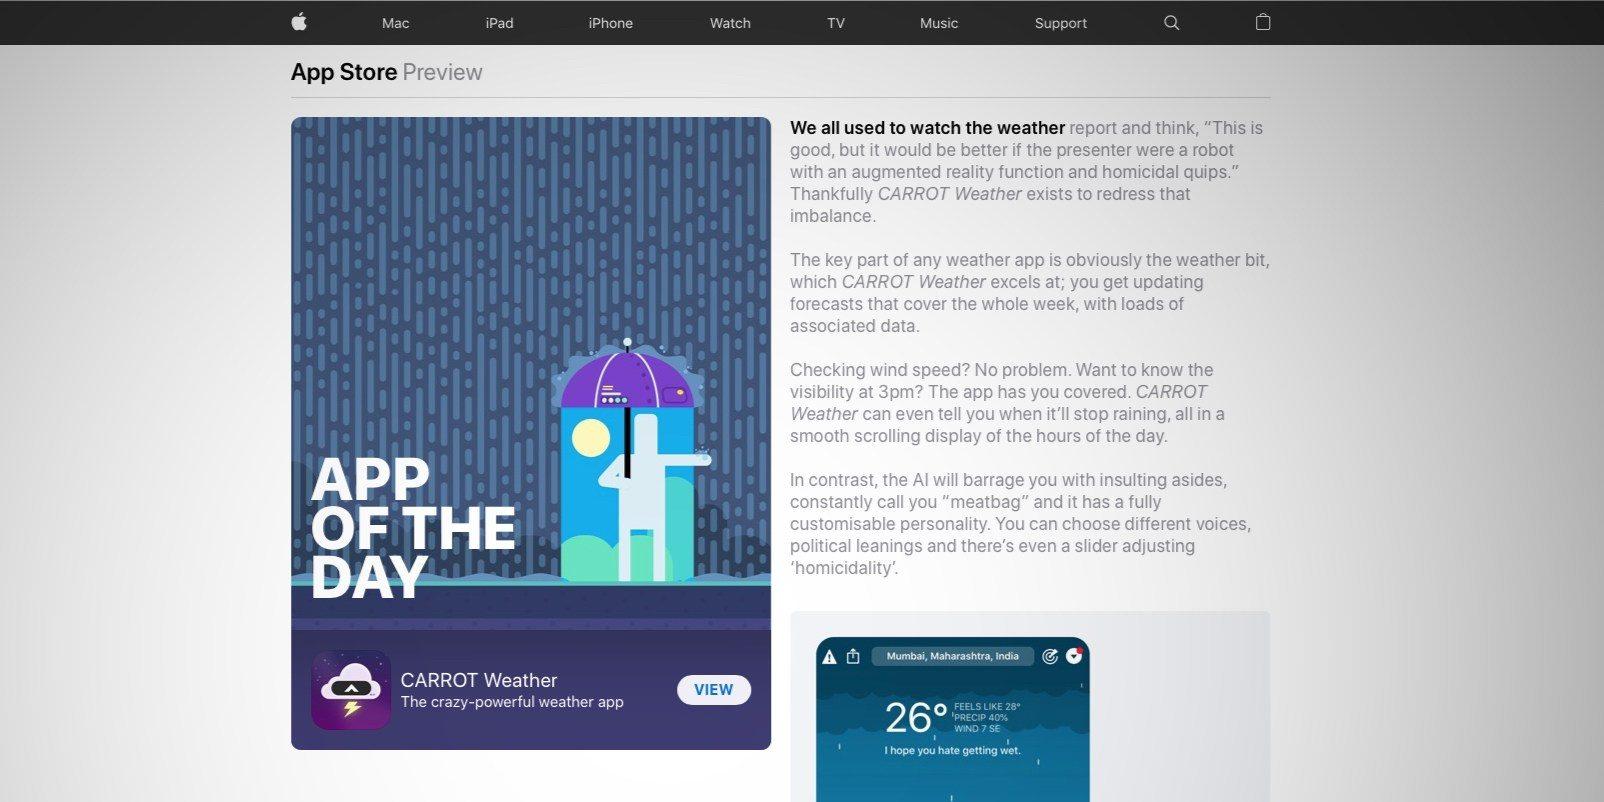 App Store Today故事终于能在网页上阅读了